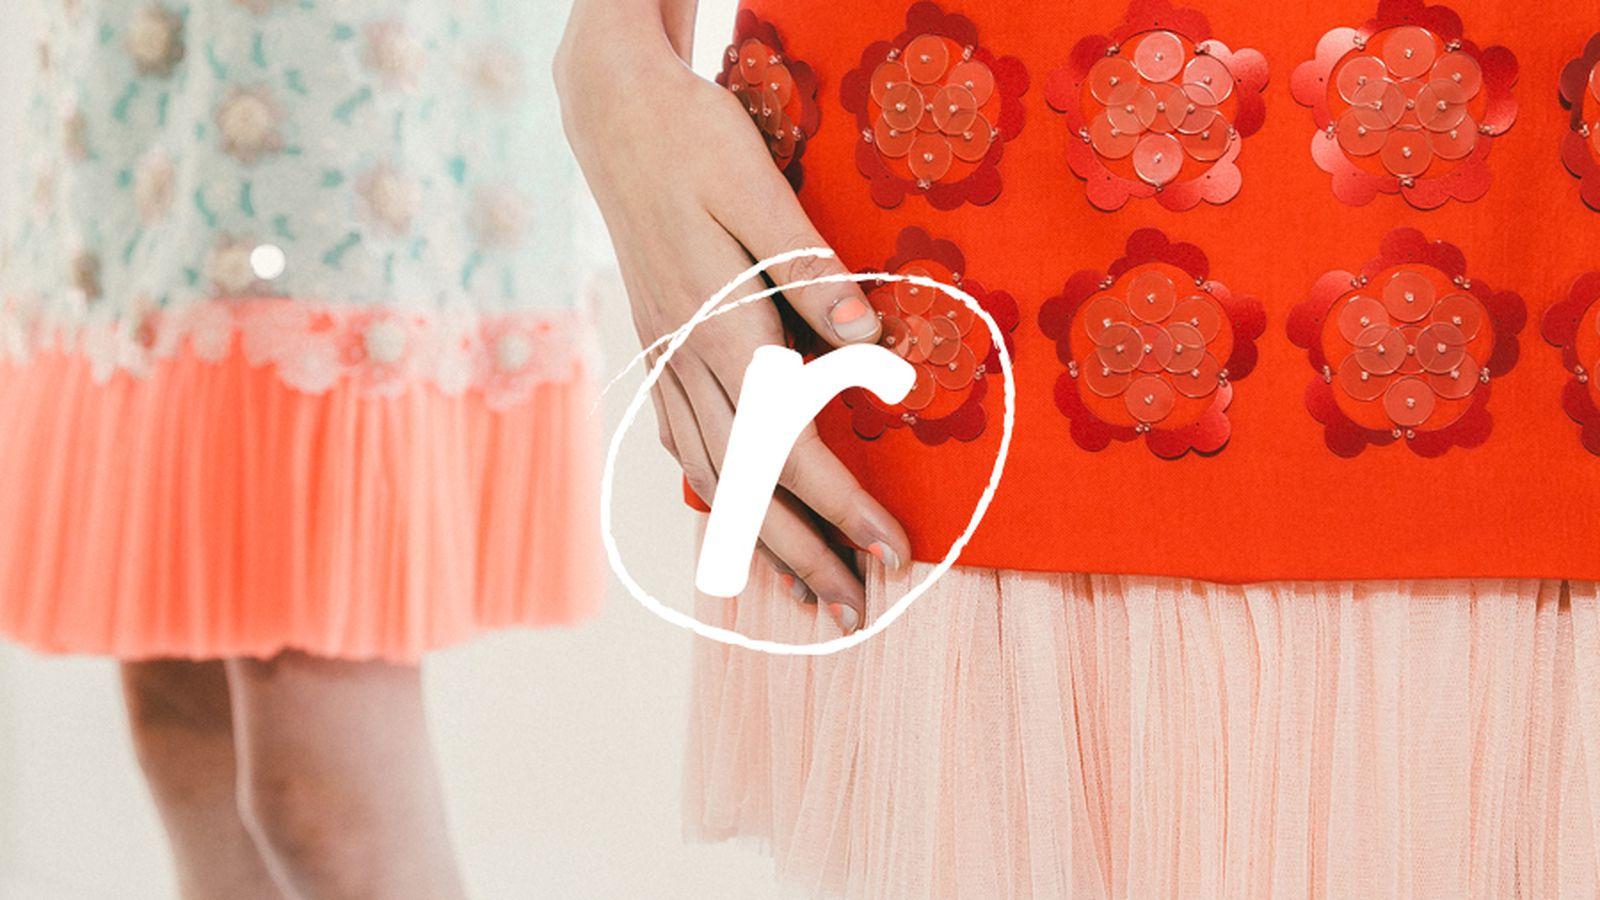 CVS Is Launching Sephora-Esque Nail Art Kiosks In Their Stores